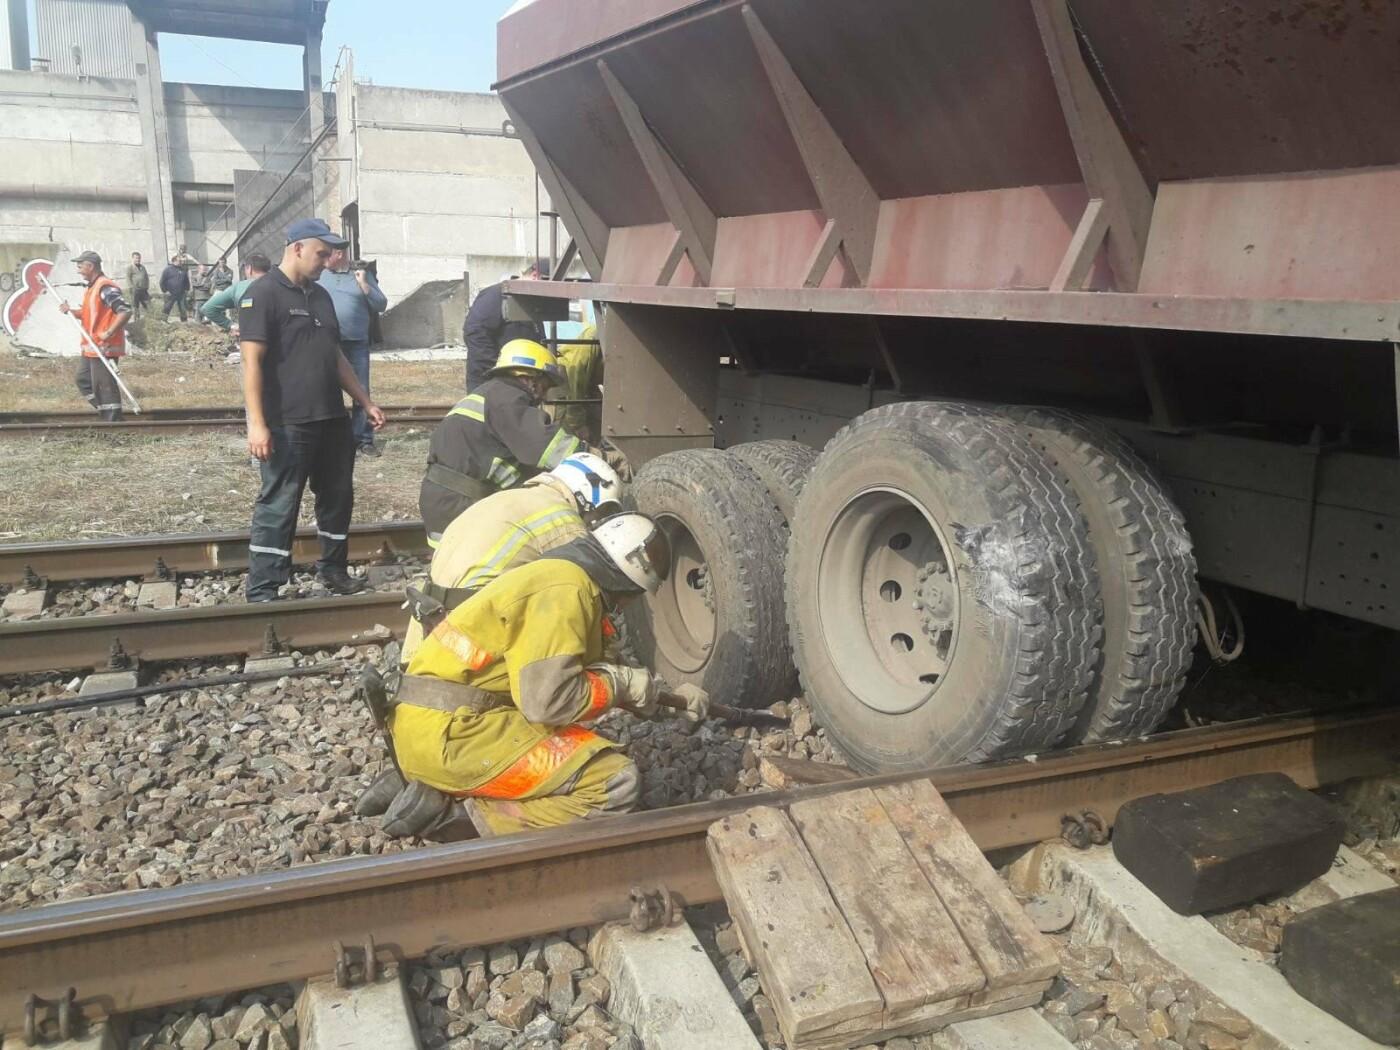 В Мелитополе на железнодорожных путях застрял грузовик, - ФОТО, фото-3